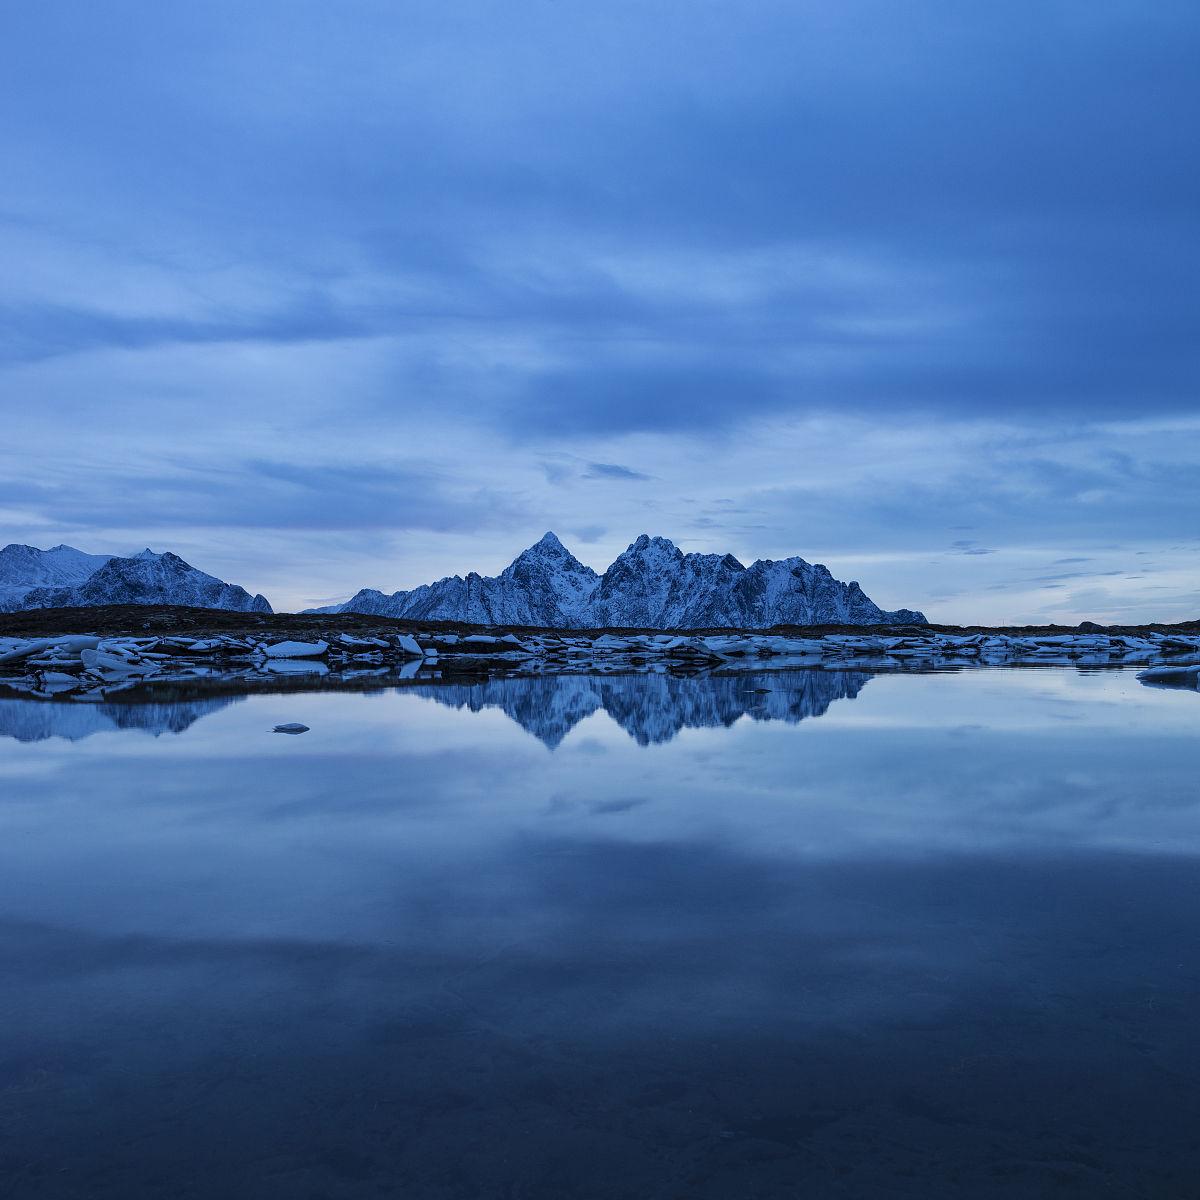 �m��y�n����_vagakallen的山峰在罗弗敦群岛群岛的海岸线,vestvagoy,倒影,挪威